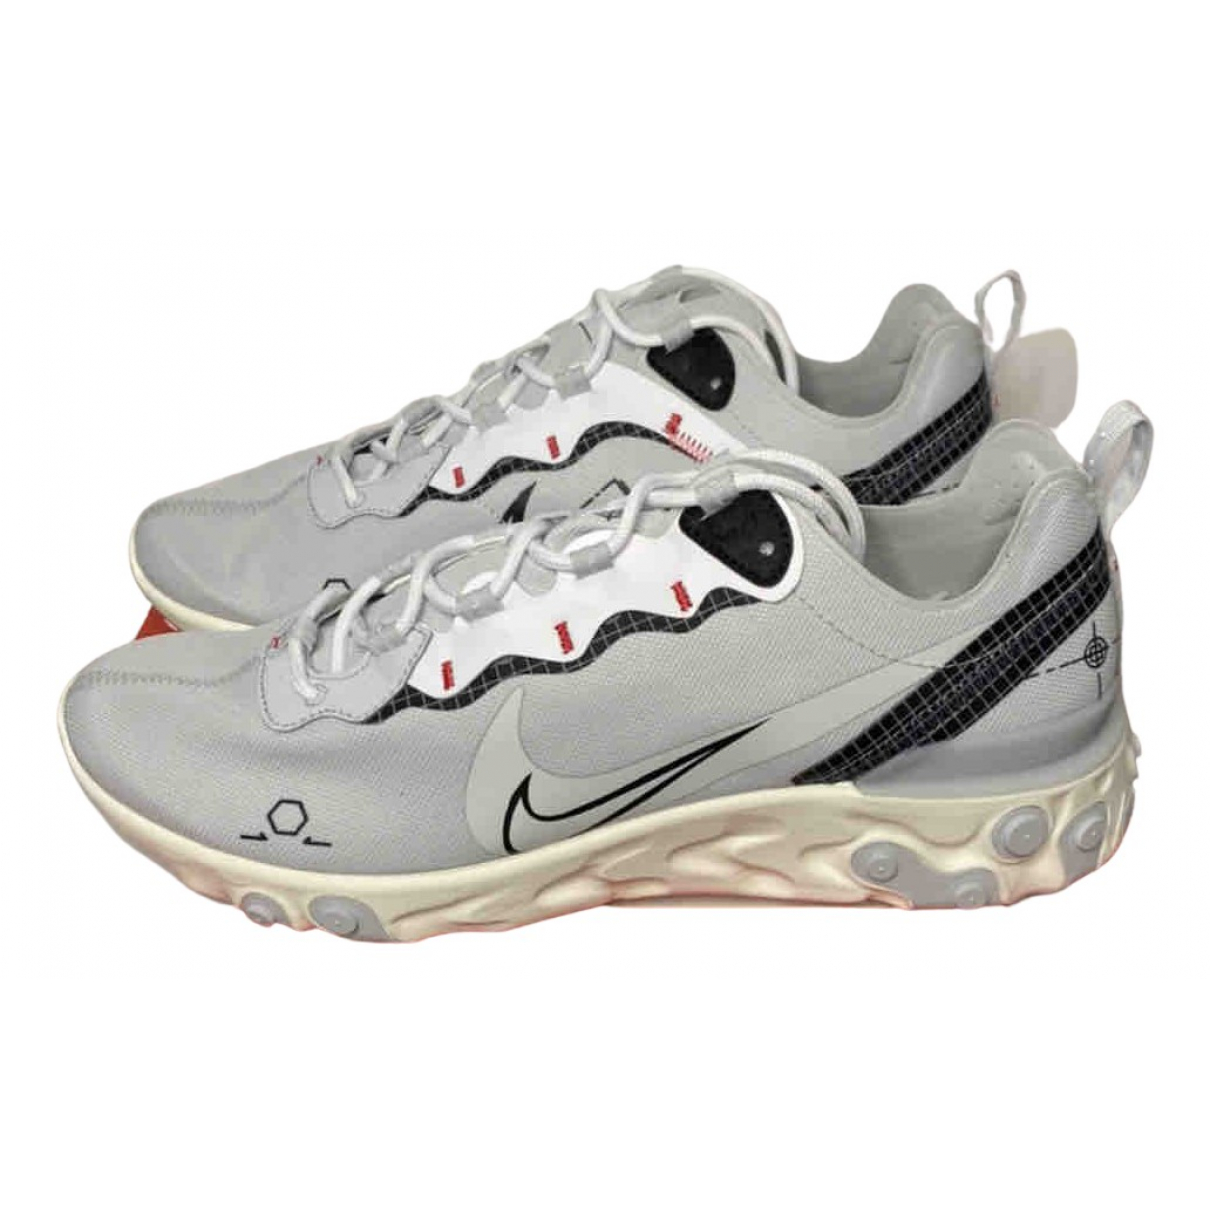 Nike React element 55 Sneakers in  Silber Leinen